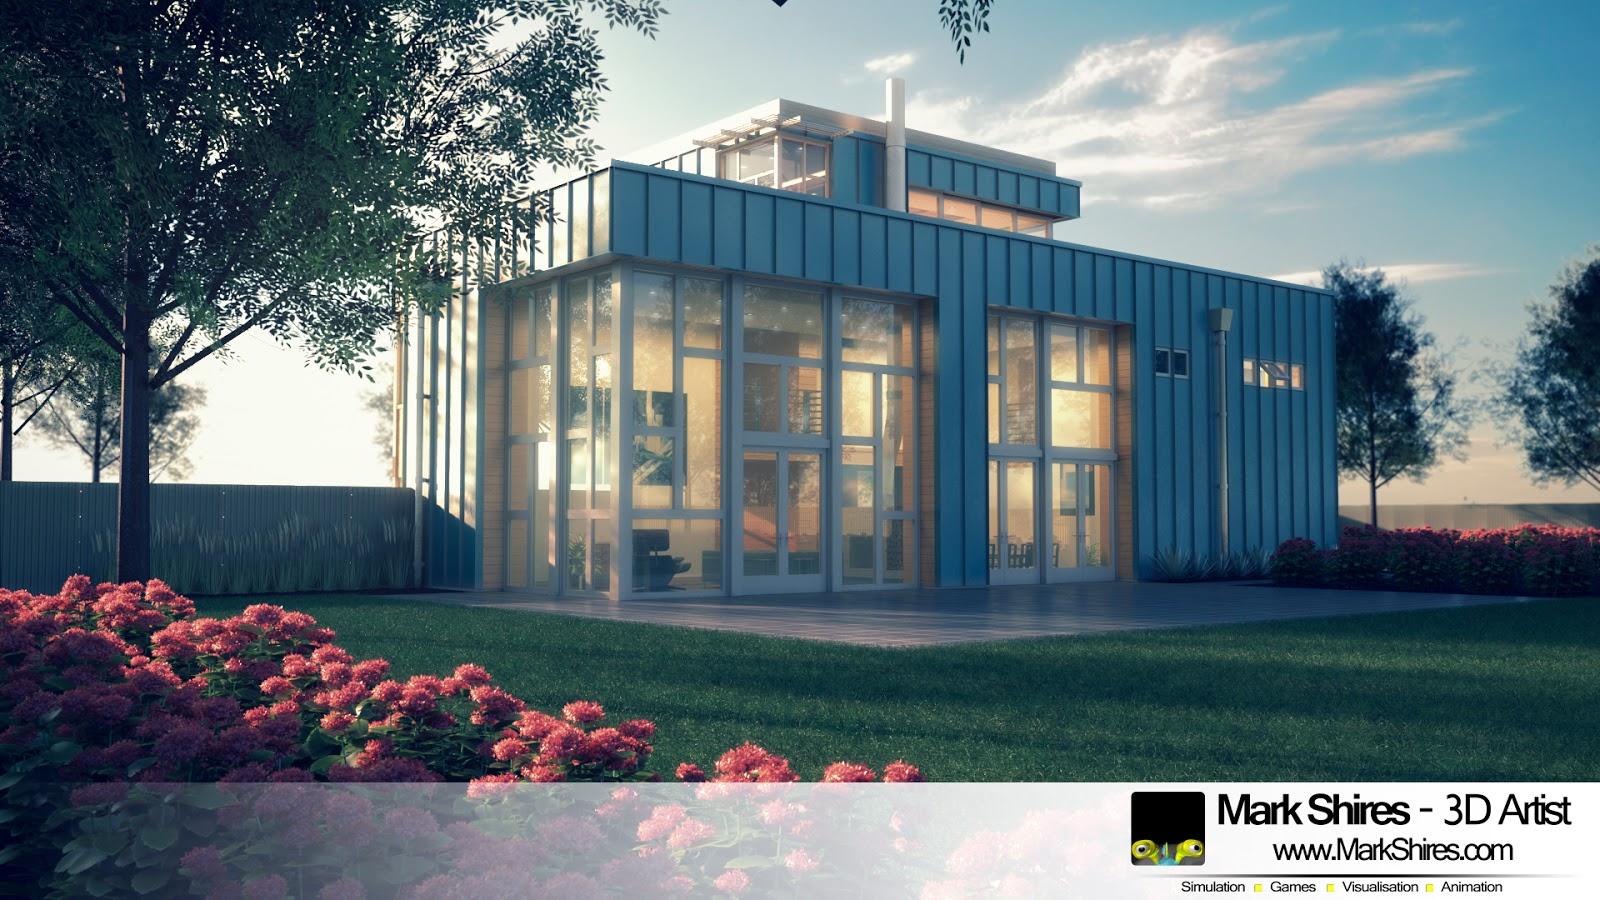 Mark Shires - 3D Artist: Modern Industrial Inspired Property